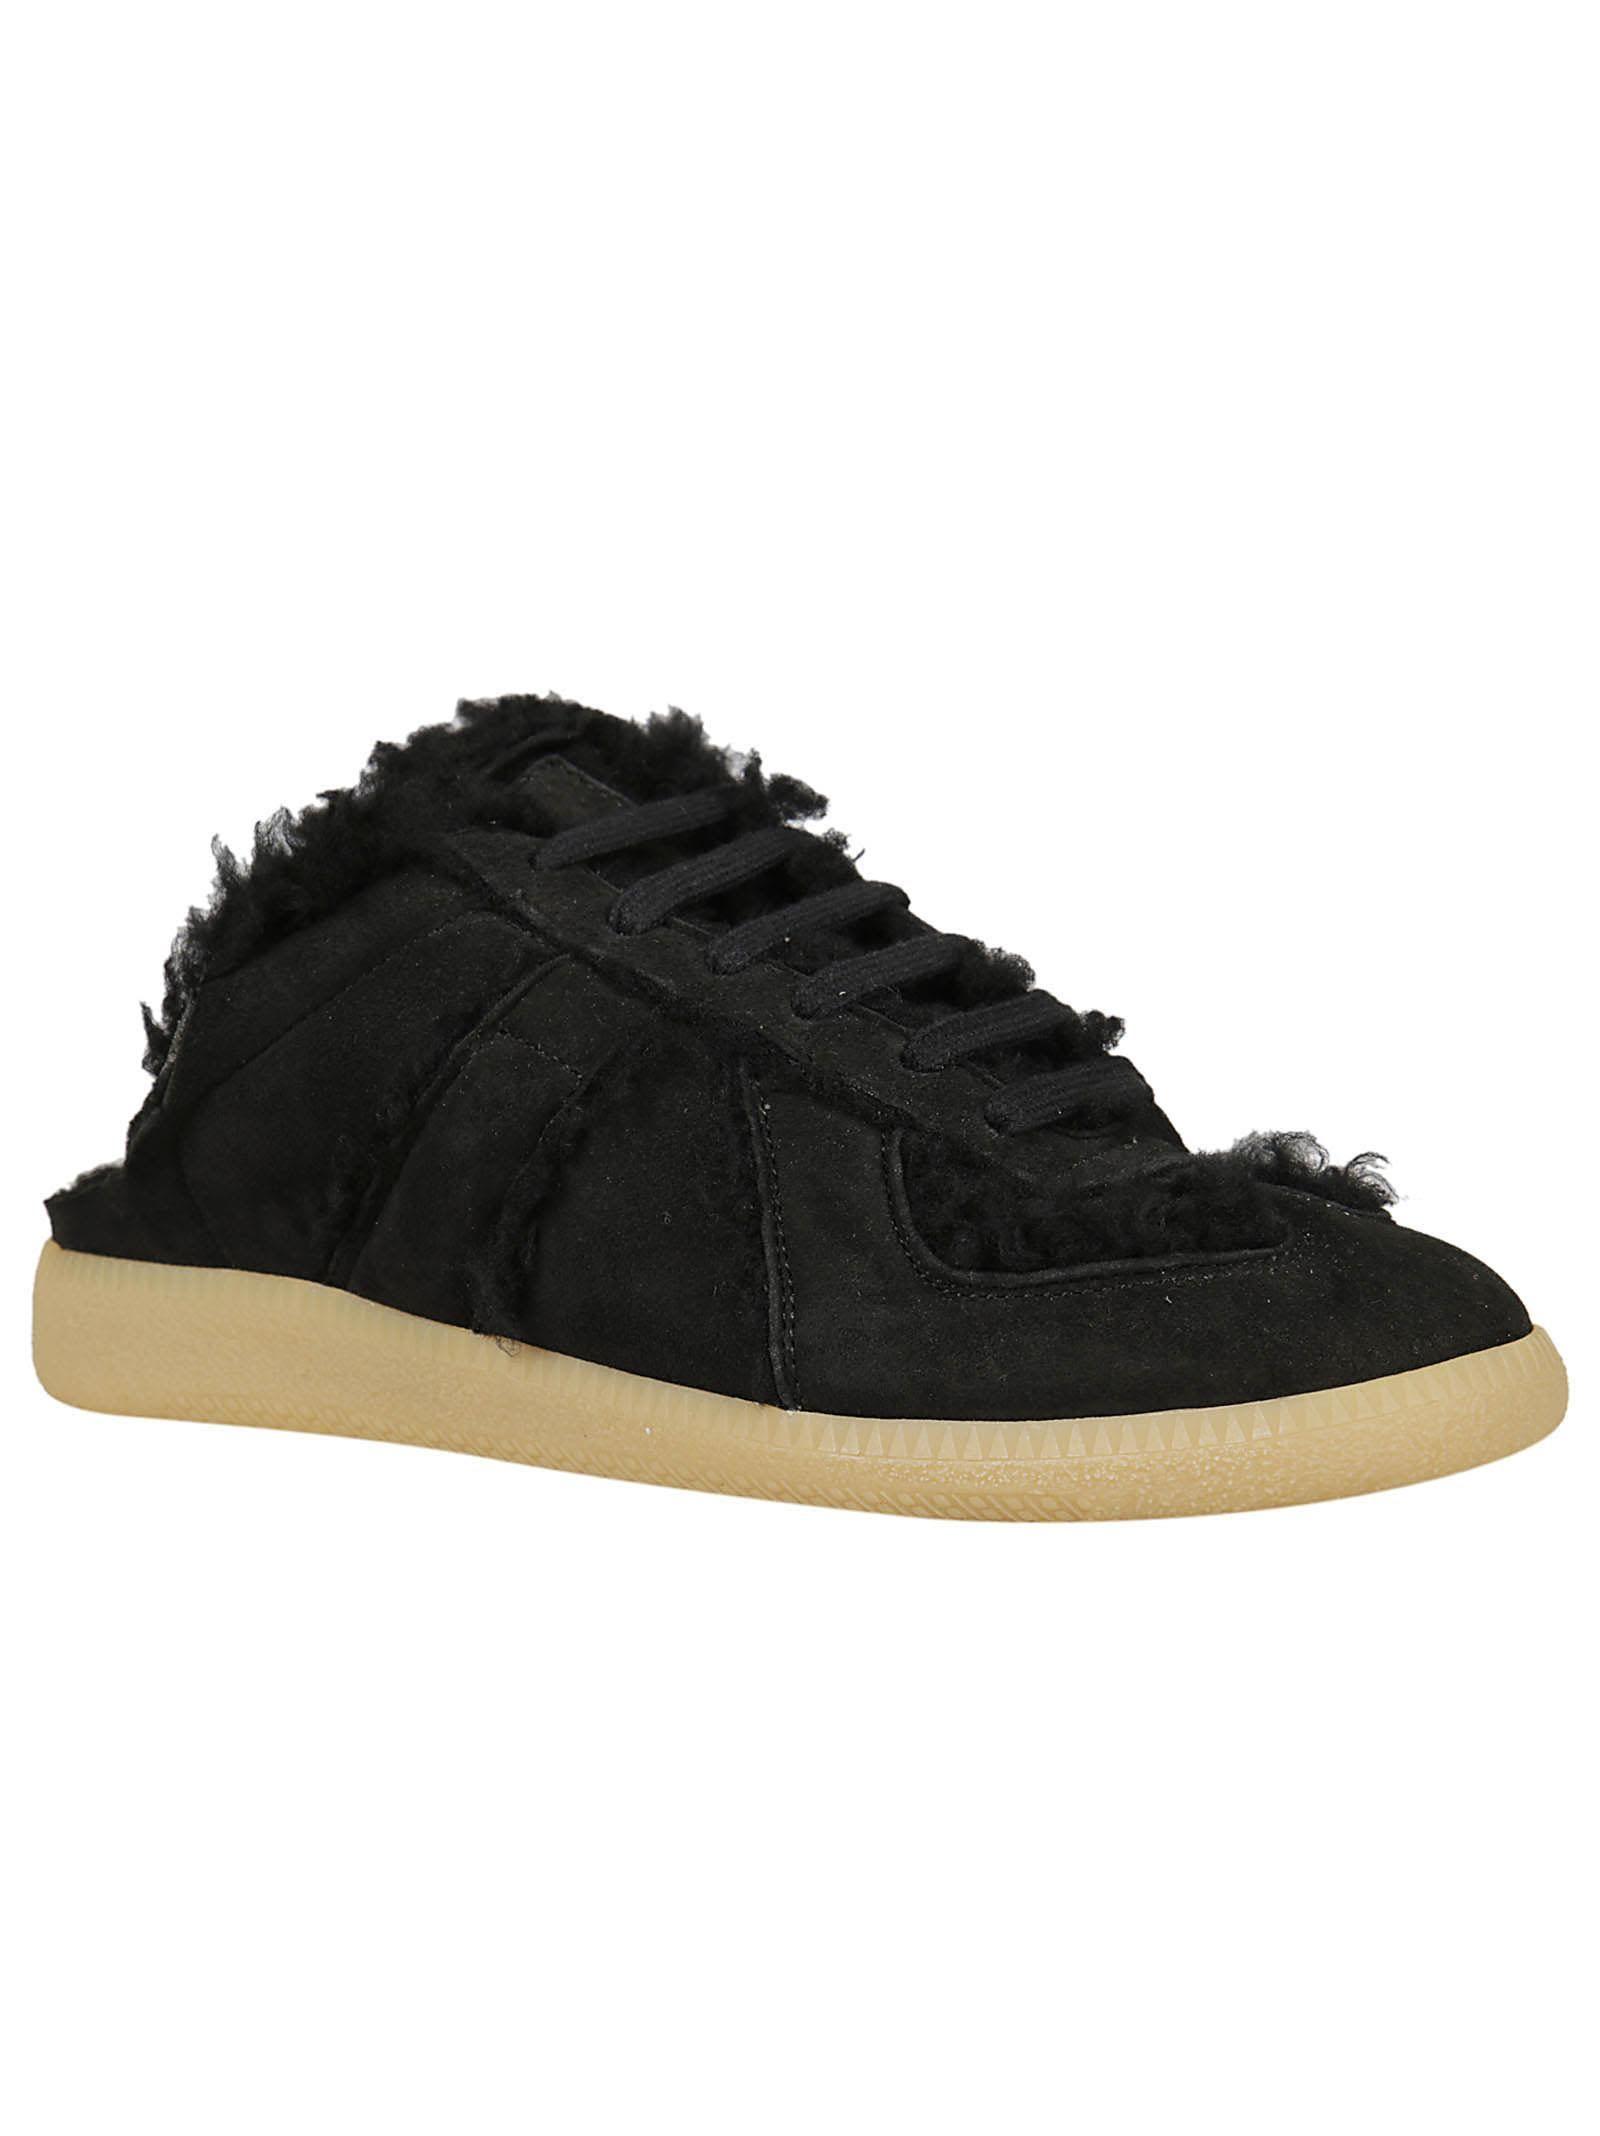 e08aa4b9fdc66 Maison Margiela Replica Mule Sneakers | fashion | Margiela replica ...